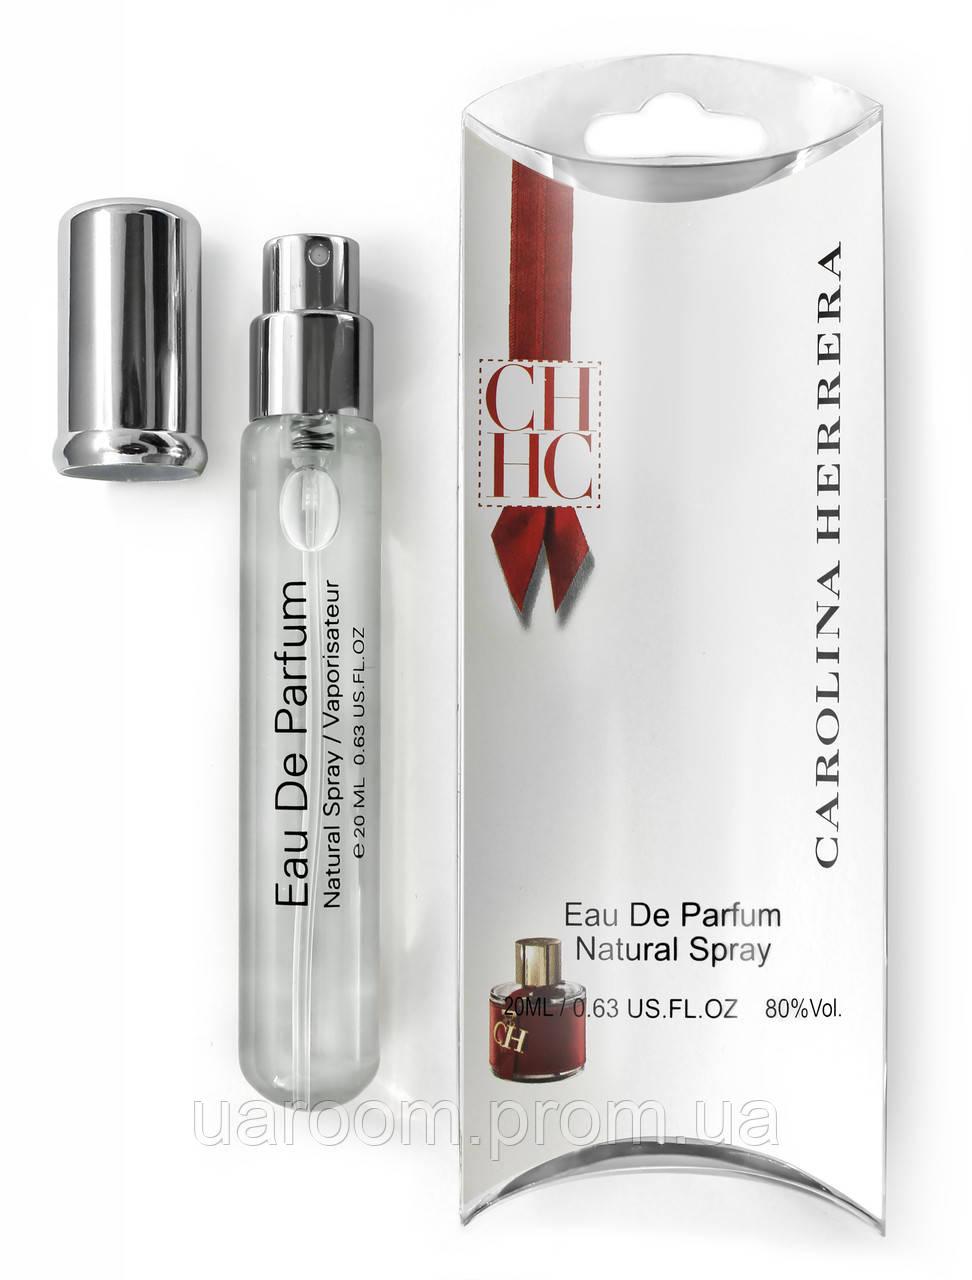 Міні-парфум жіночий Сarolina Herrera CH, 20 мл